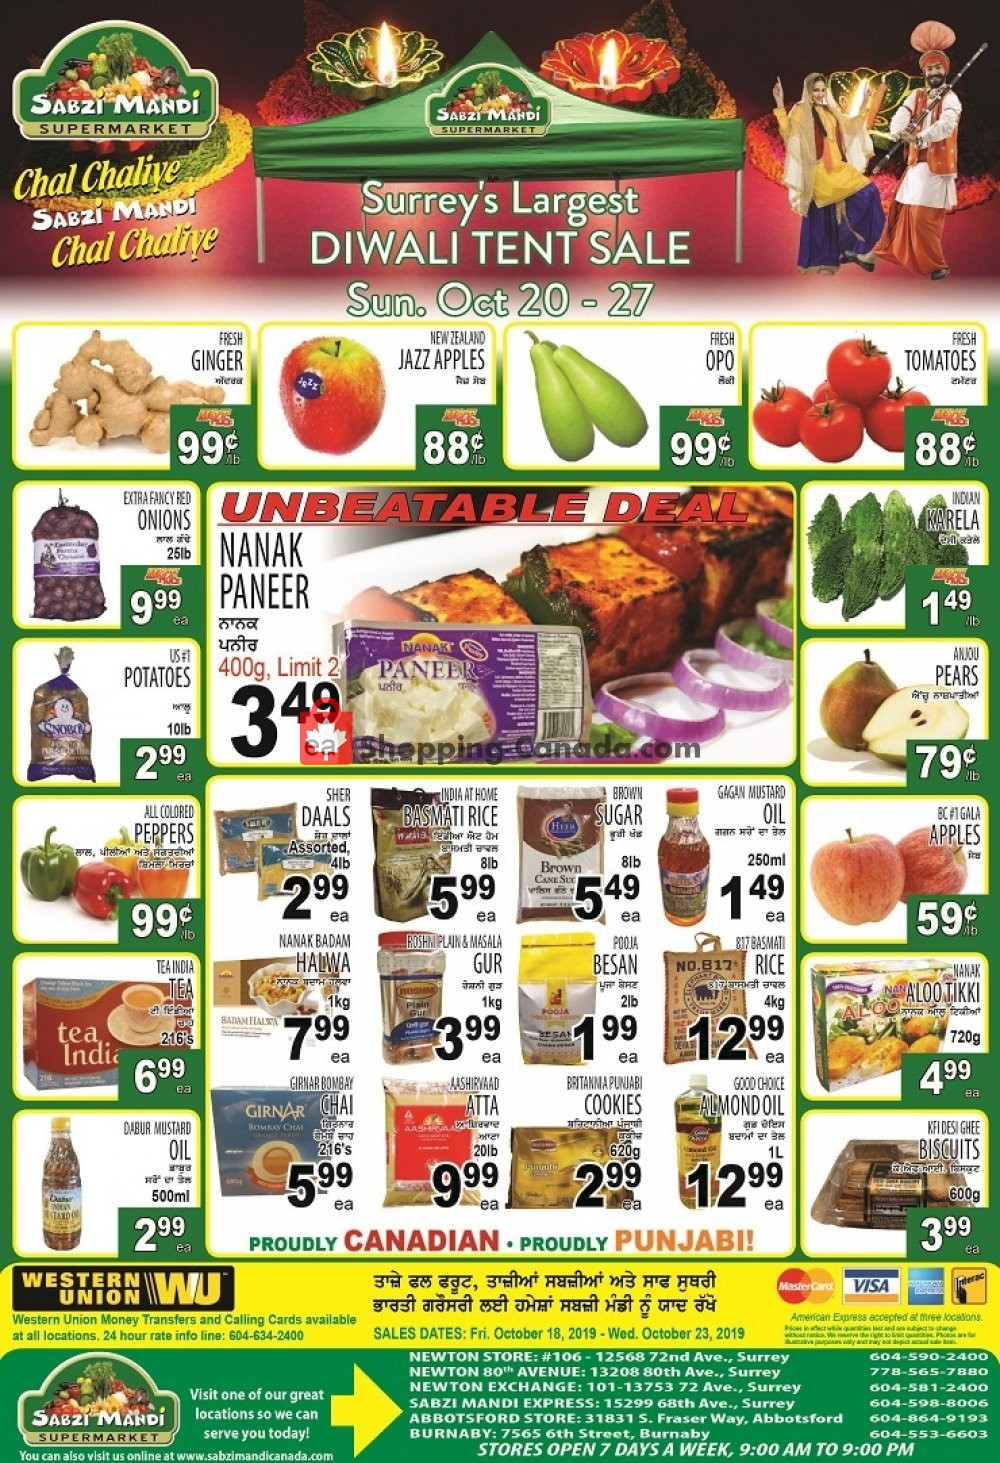 Flyer Sabzi Mandi Supermarket Canada - from Friday October 18, 2019 to Wednesday October 23, 2019